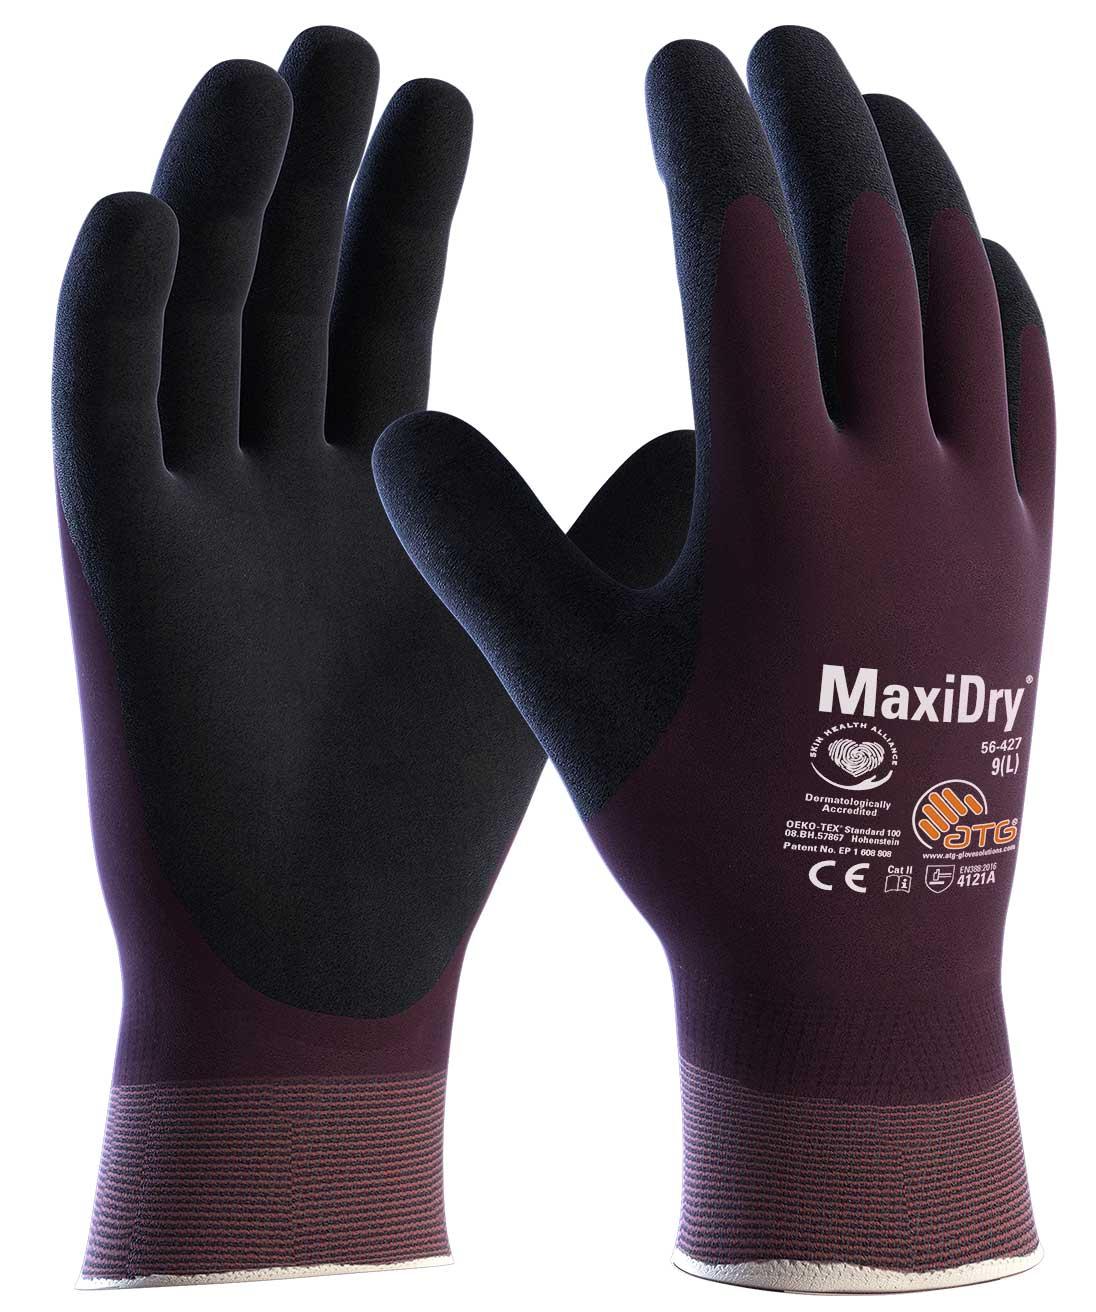 56-427 MaxiDry® Fully Coated Knitwrist Image